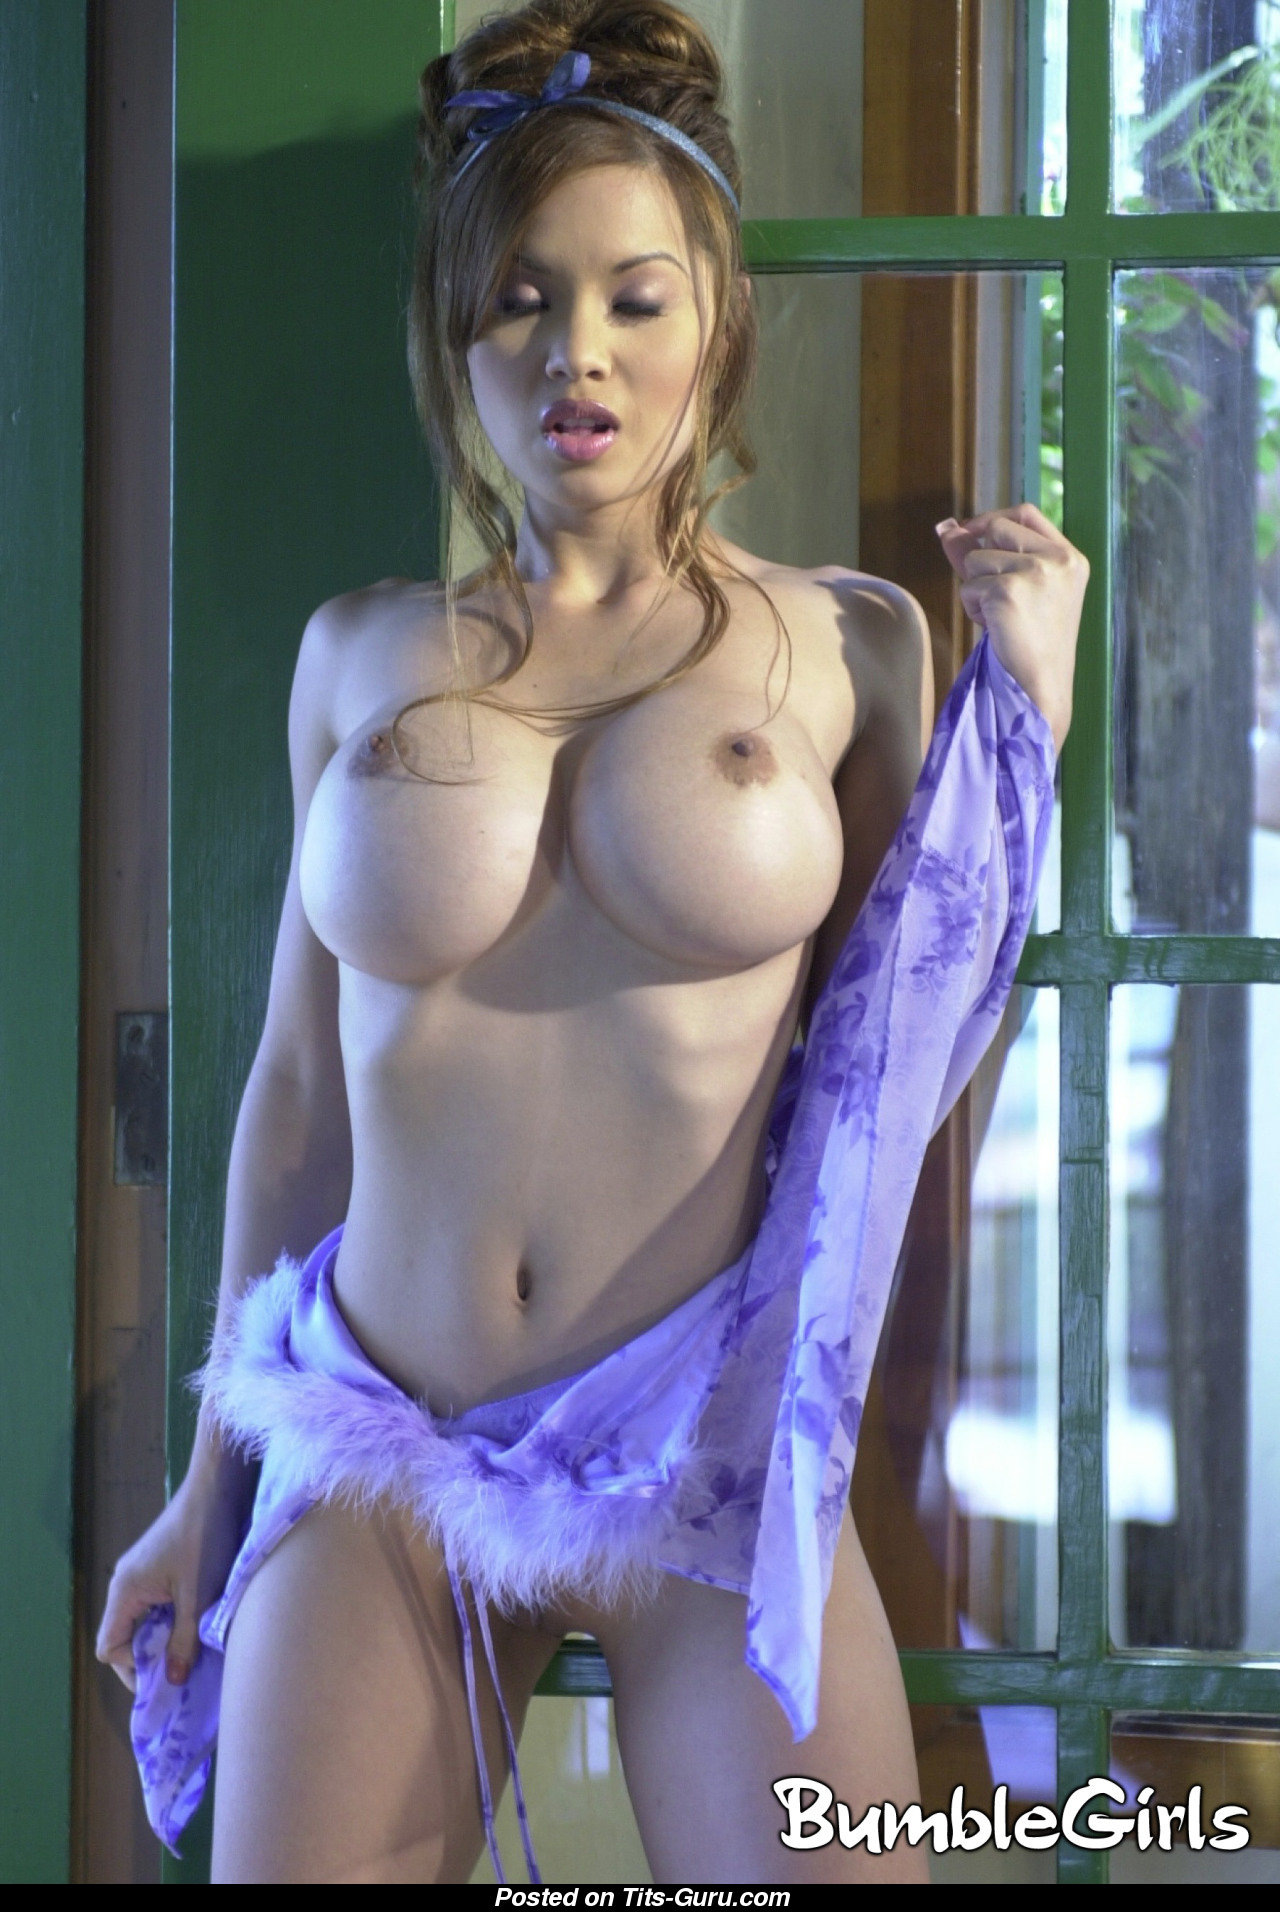 Sexy girls flashing their boobs